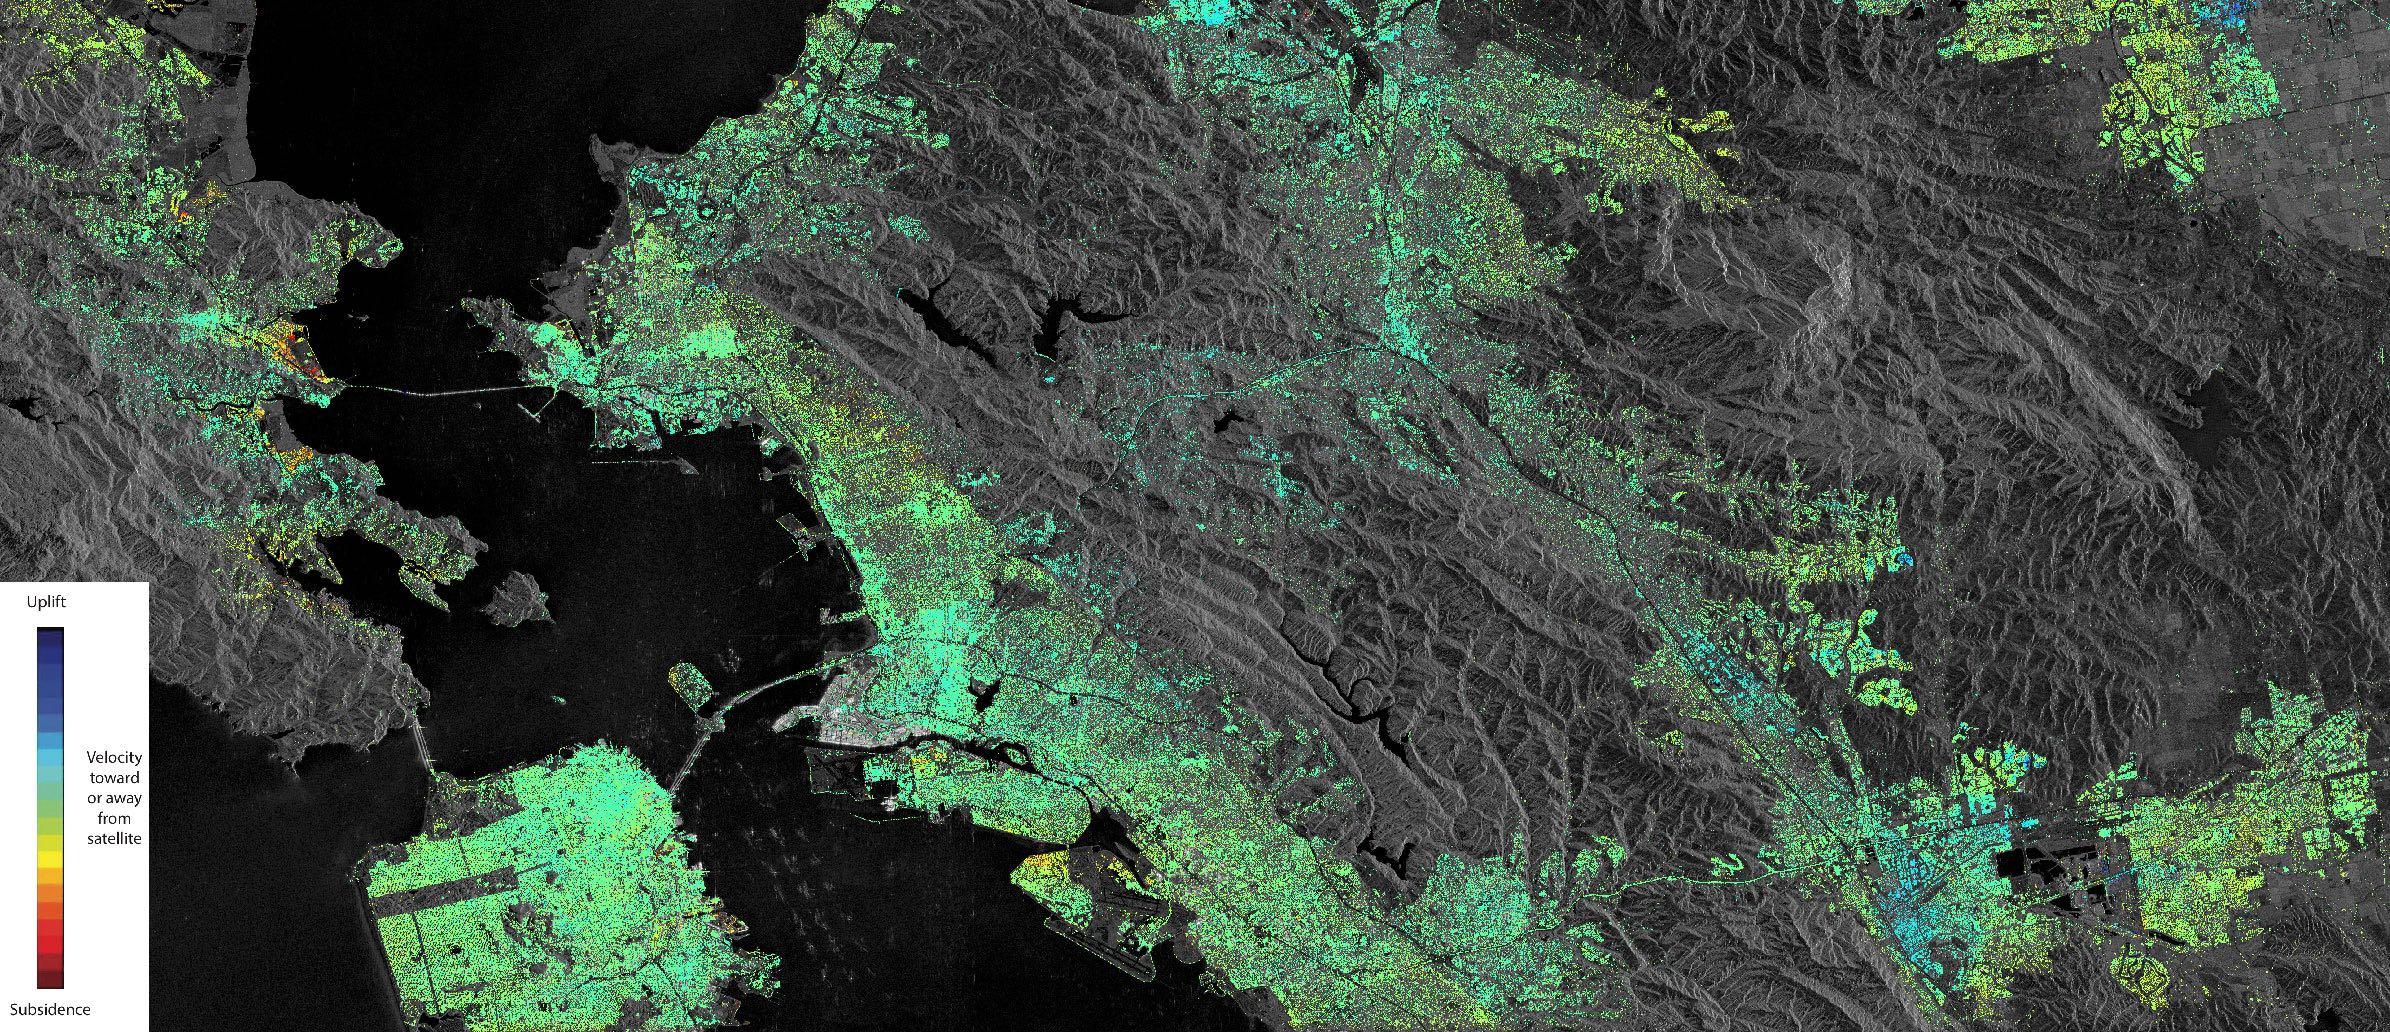 Bay-Area-subsidence-uplift-map